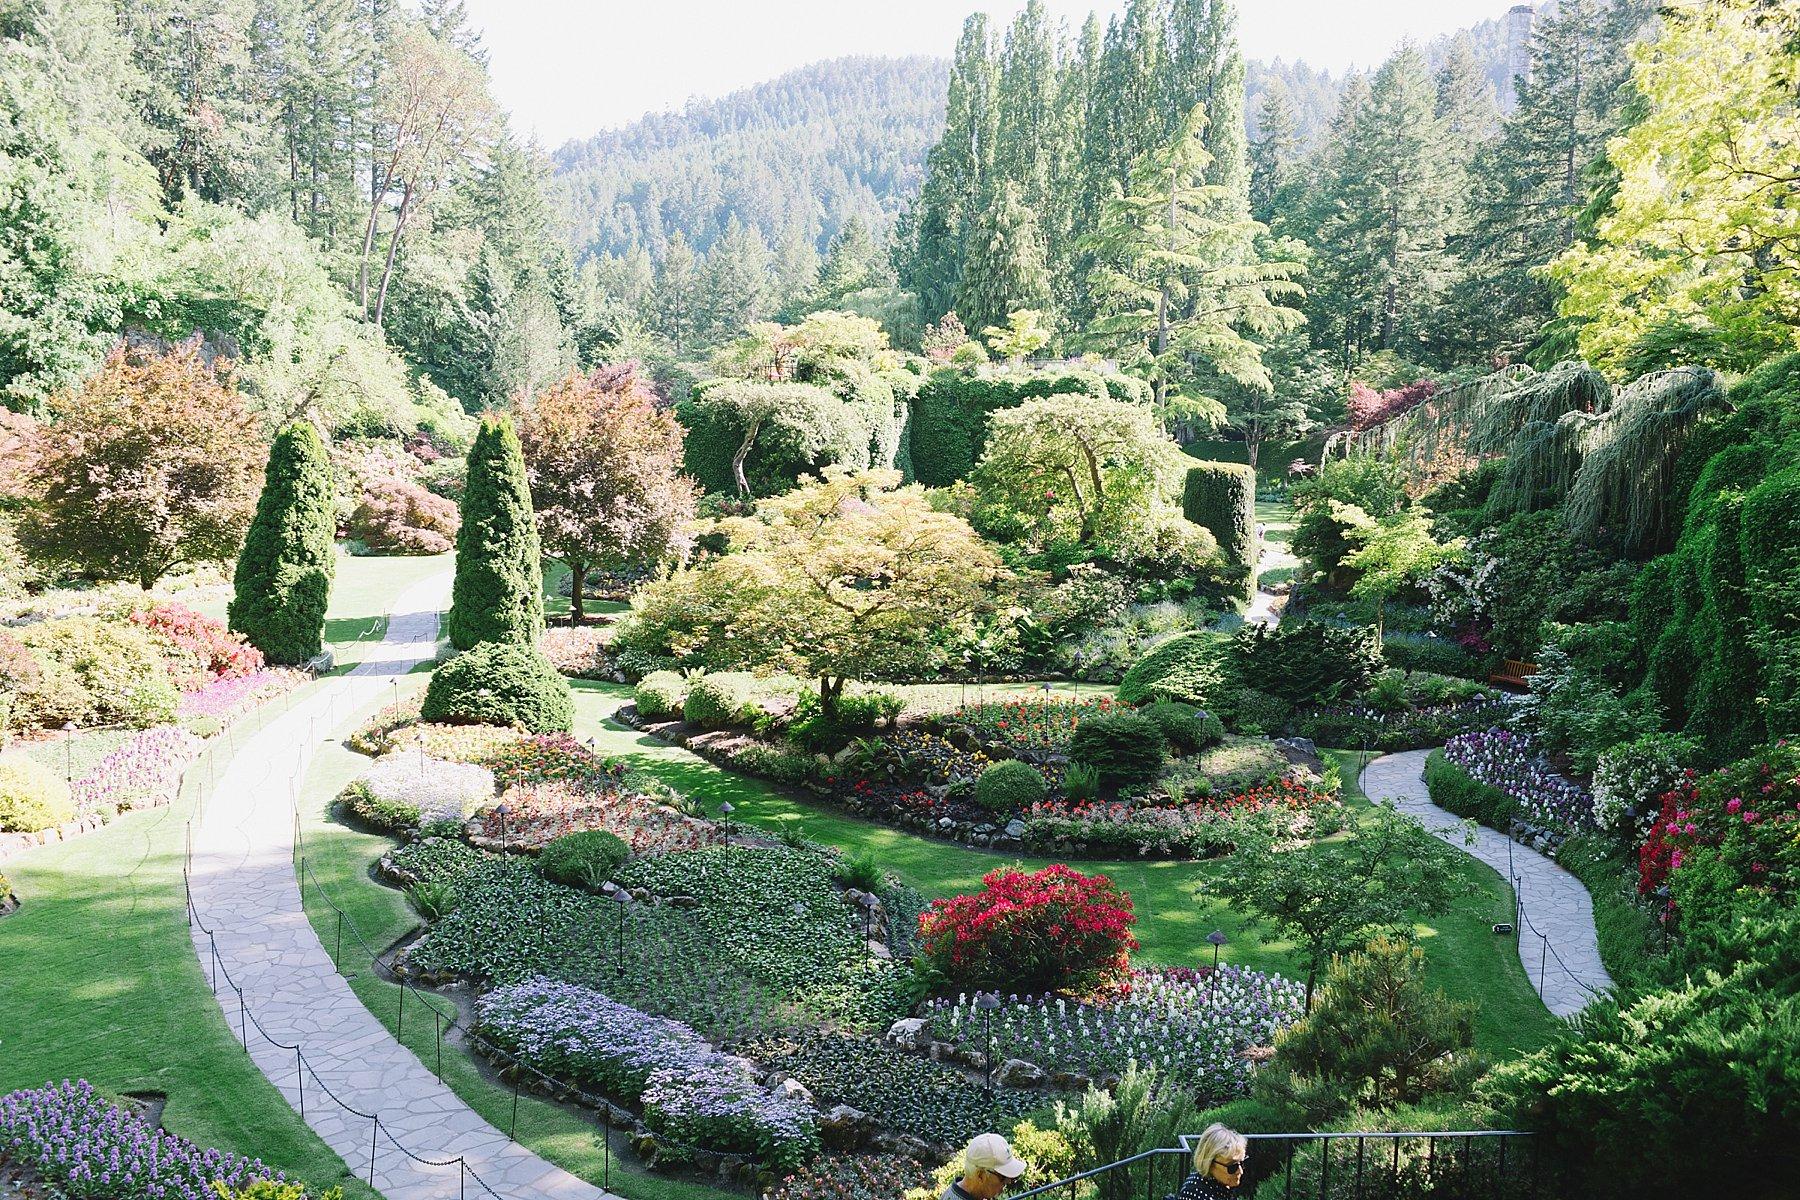 butchart gardens in Victoria Canada sunken garden